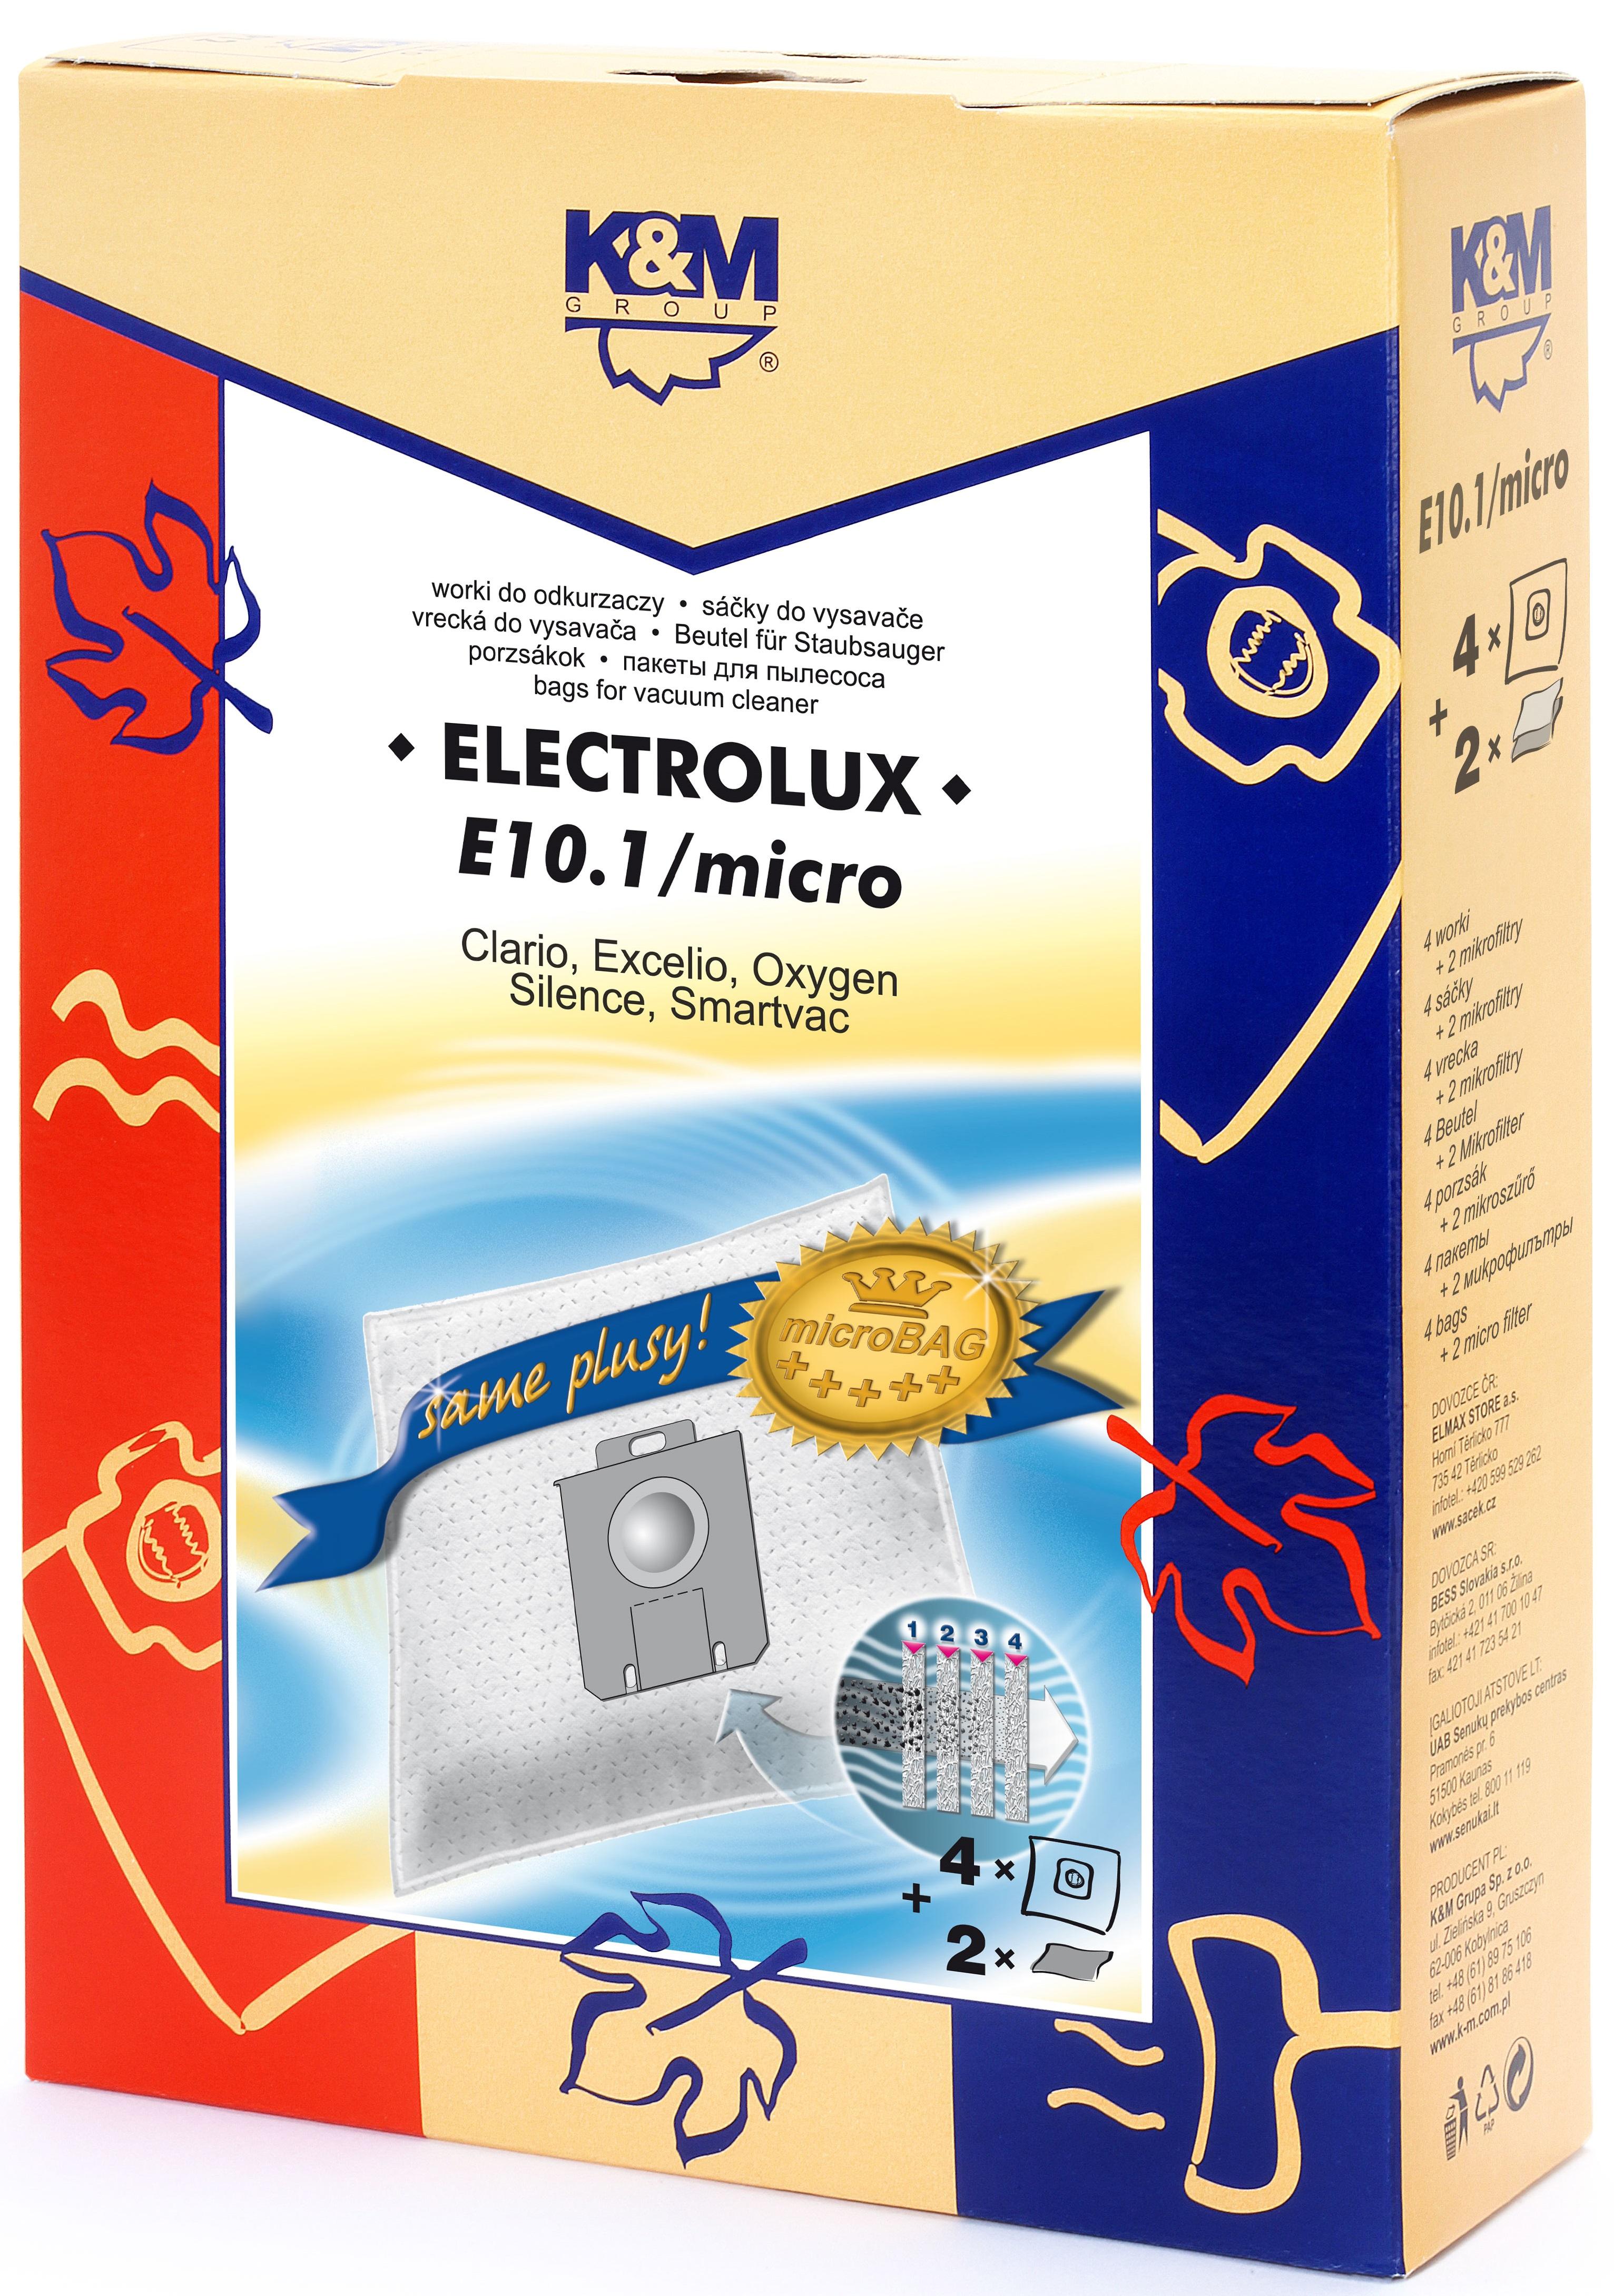 Sac aspirator Electrolux Clario, sintetic, 4X saci + 2 filtre, K&M [0]